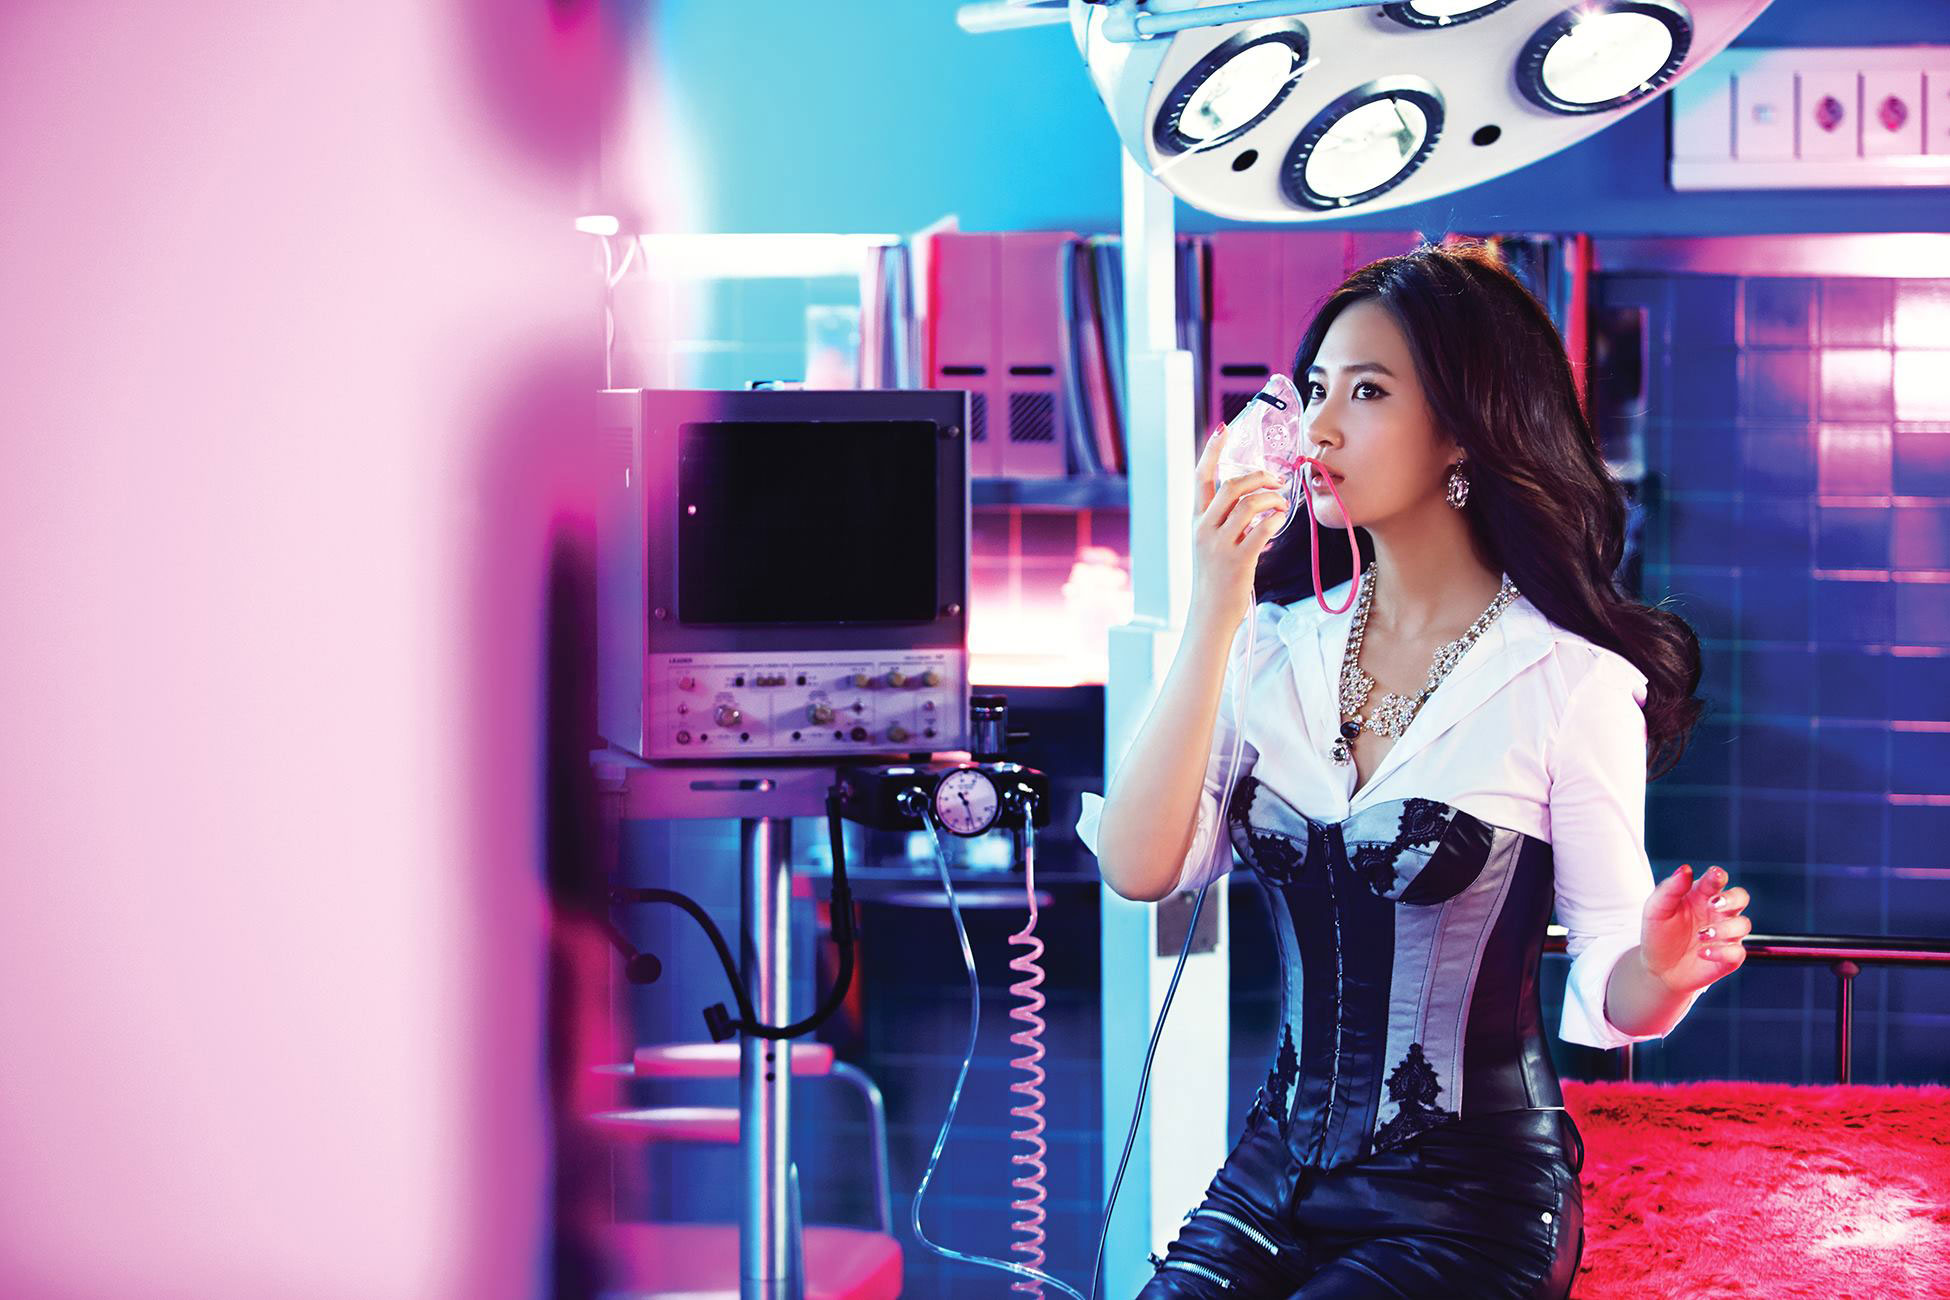 Boy And Girl Wallpaper Full Hd Tiffany Sooyoung Yuri Mr Mr Hd Concept Image Snsd Pics